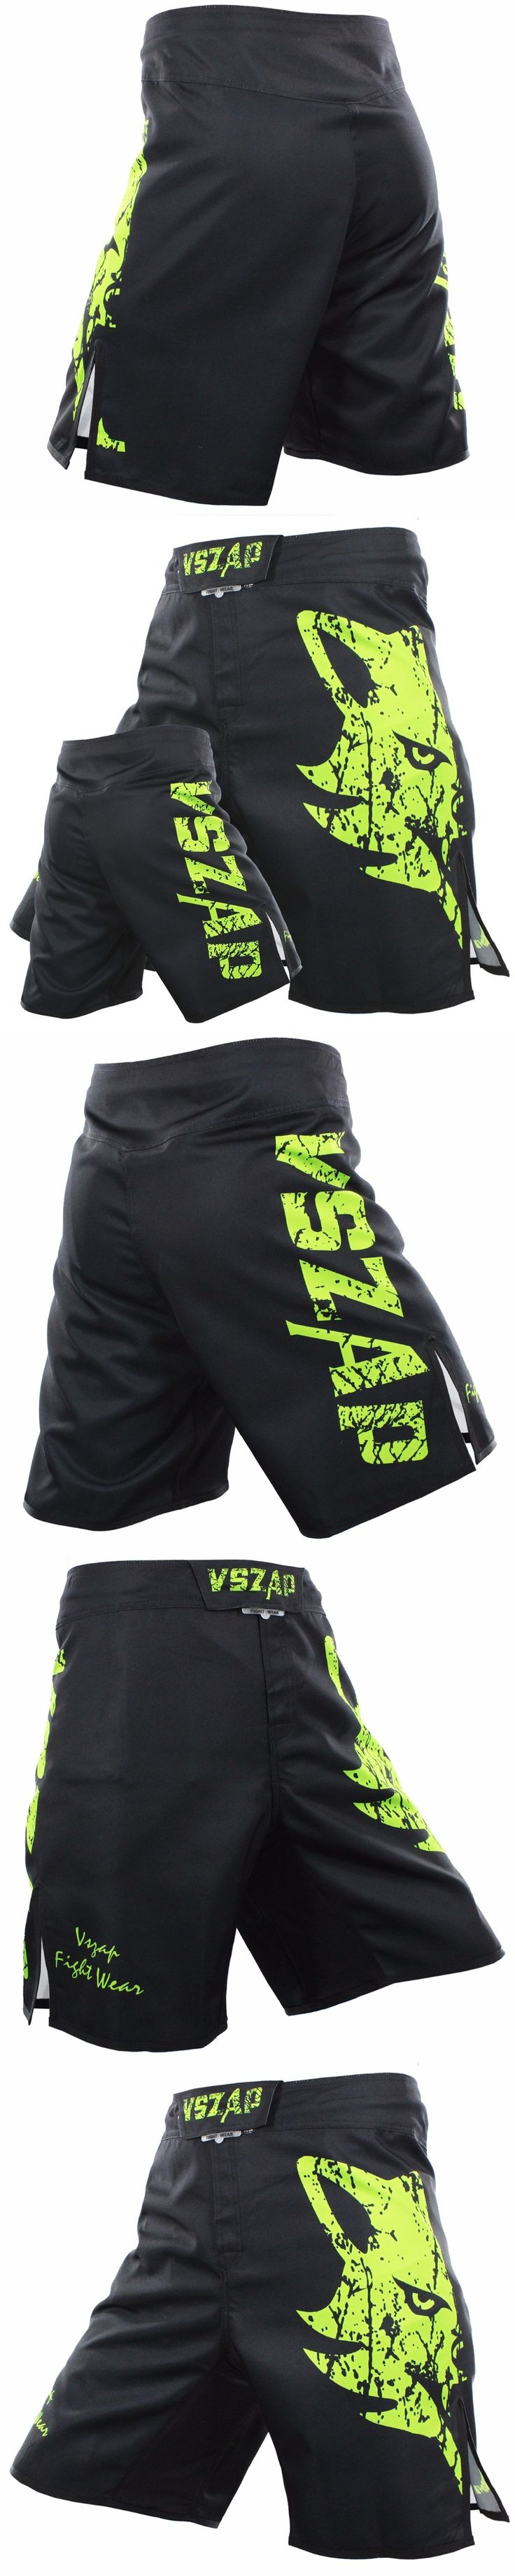 VSZAP Men's Muay Thai Boxing Shorts Printing MMA Shorts Fight Grappling Short Polyester Kick Gel Thai Boxing Shorts MMA Boxing